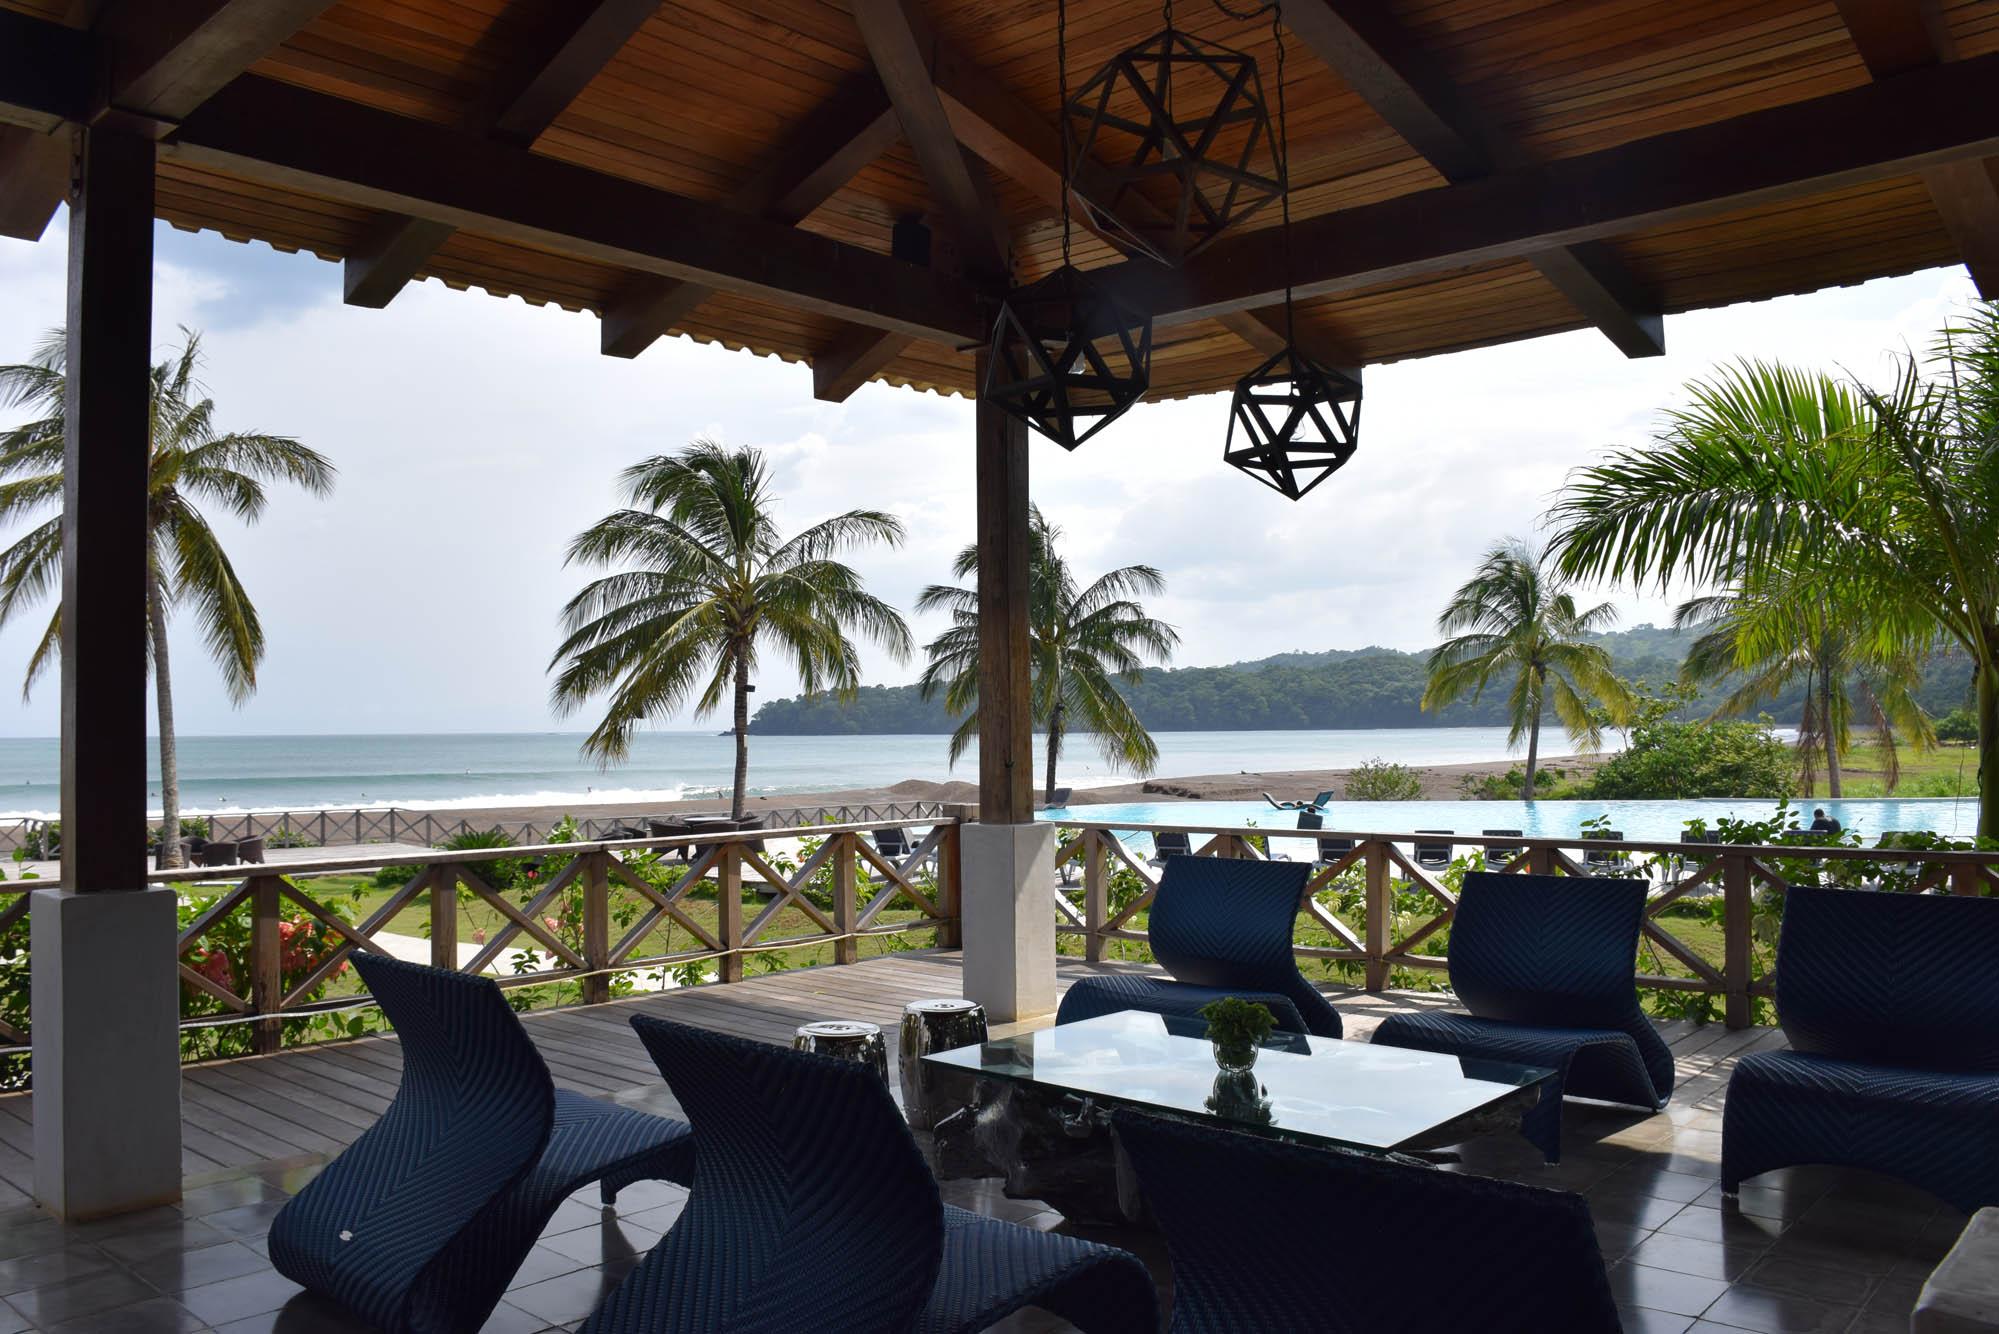 Pedasi-Isla-Iguana-Panama-Andromeda-Playa-Venao-LalaRebelo_0583